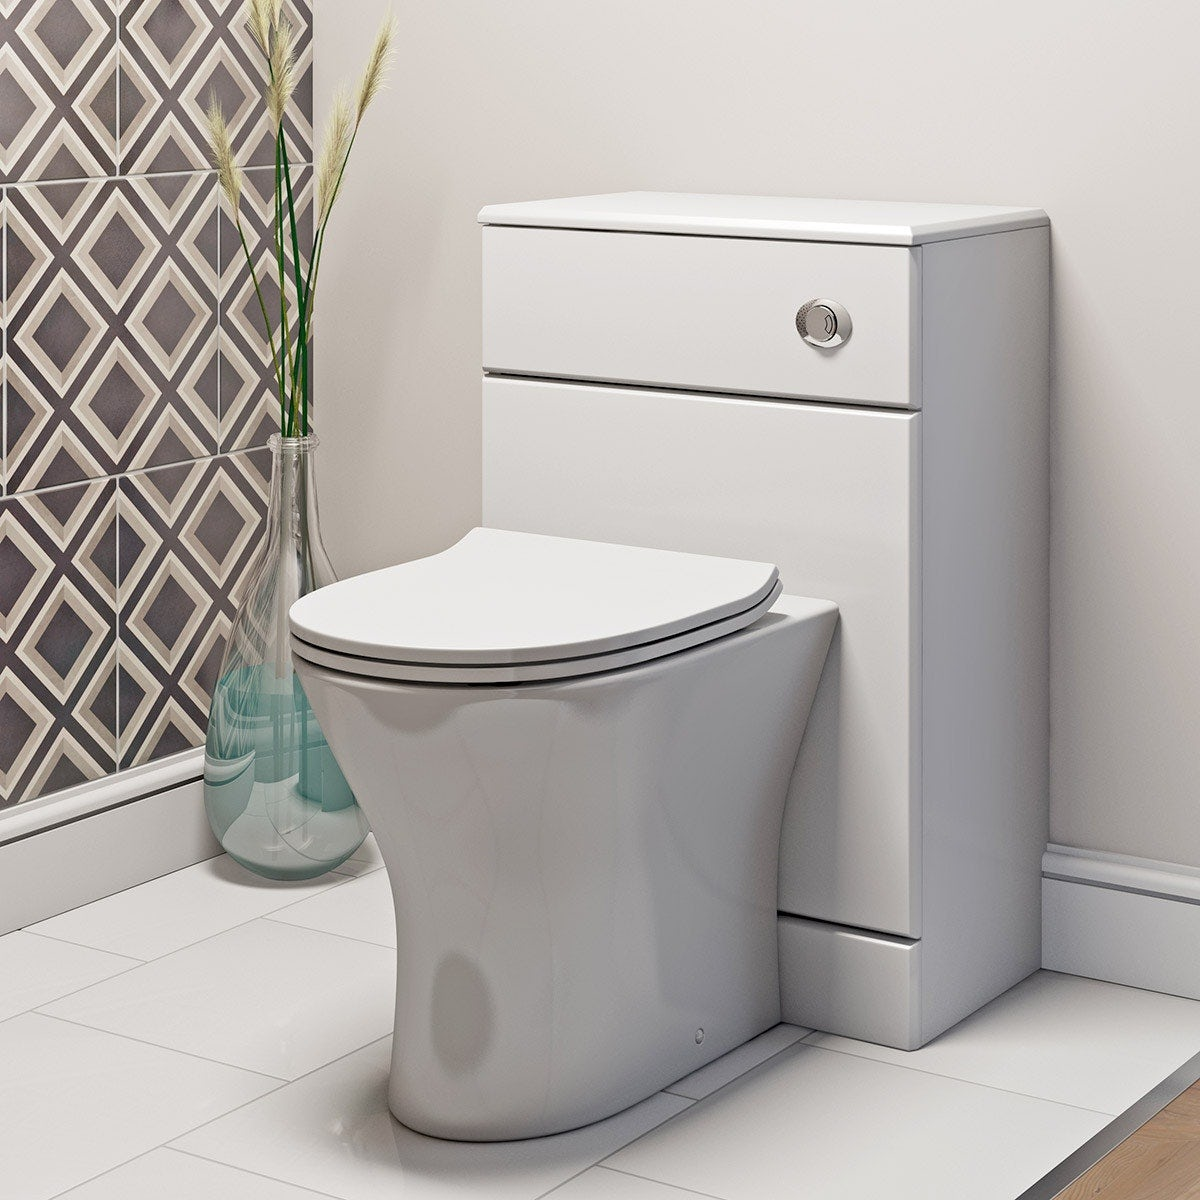 Contemporary toilets